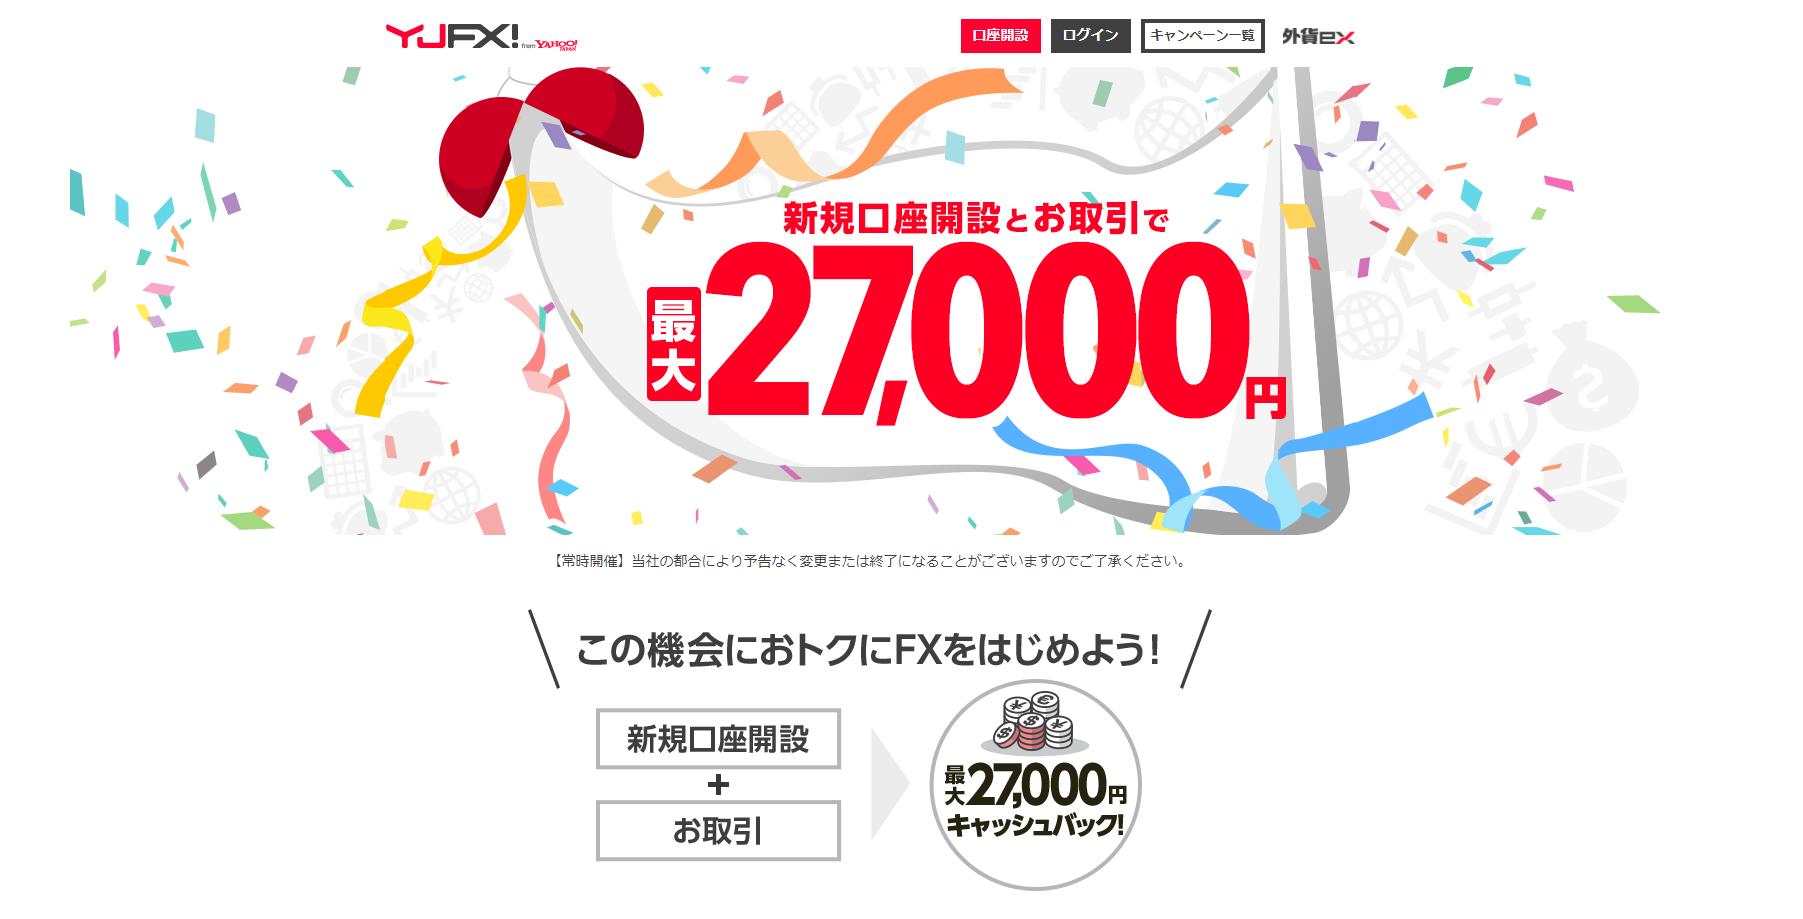 FX_ランキング_おすすめのFX会社比較ランキング_YJFX!